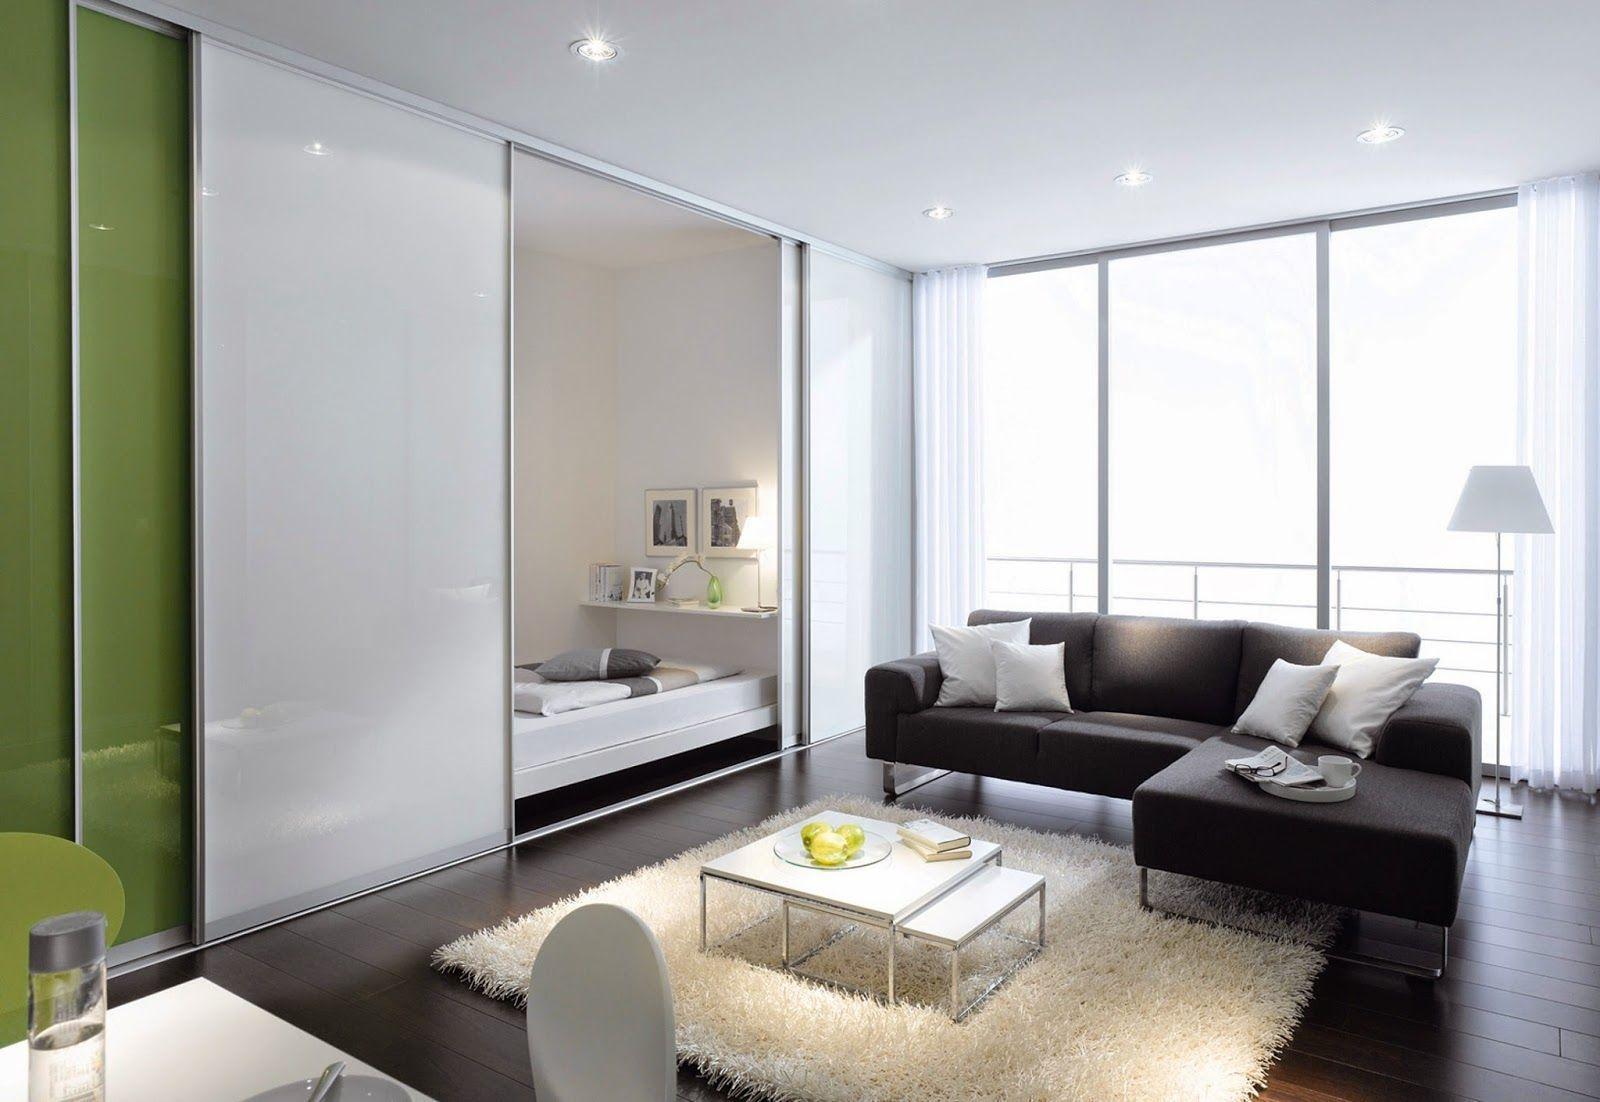 Door divider designs for room partition largeroomdividerideas